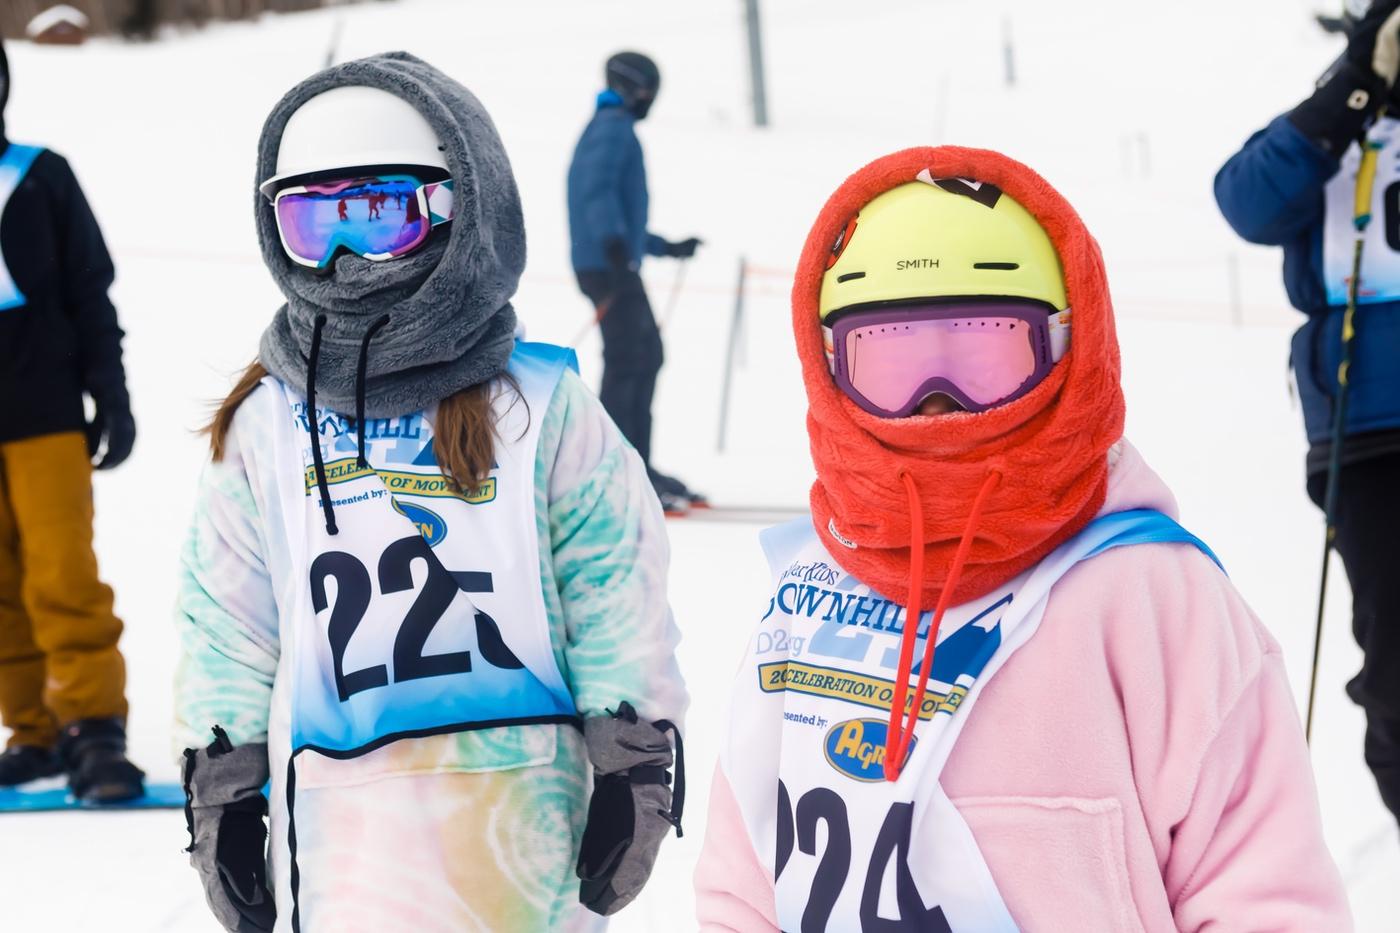 WinterKids Downhill 24 2021 SDP 2907